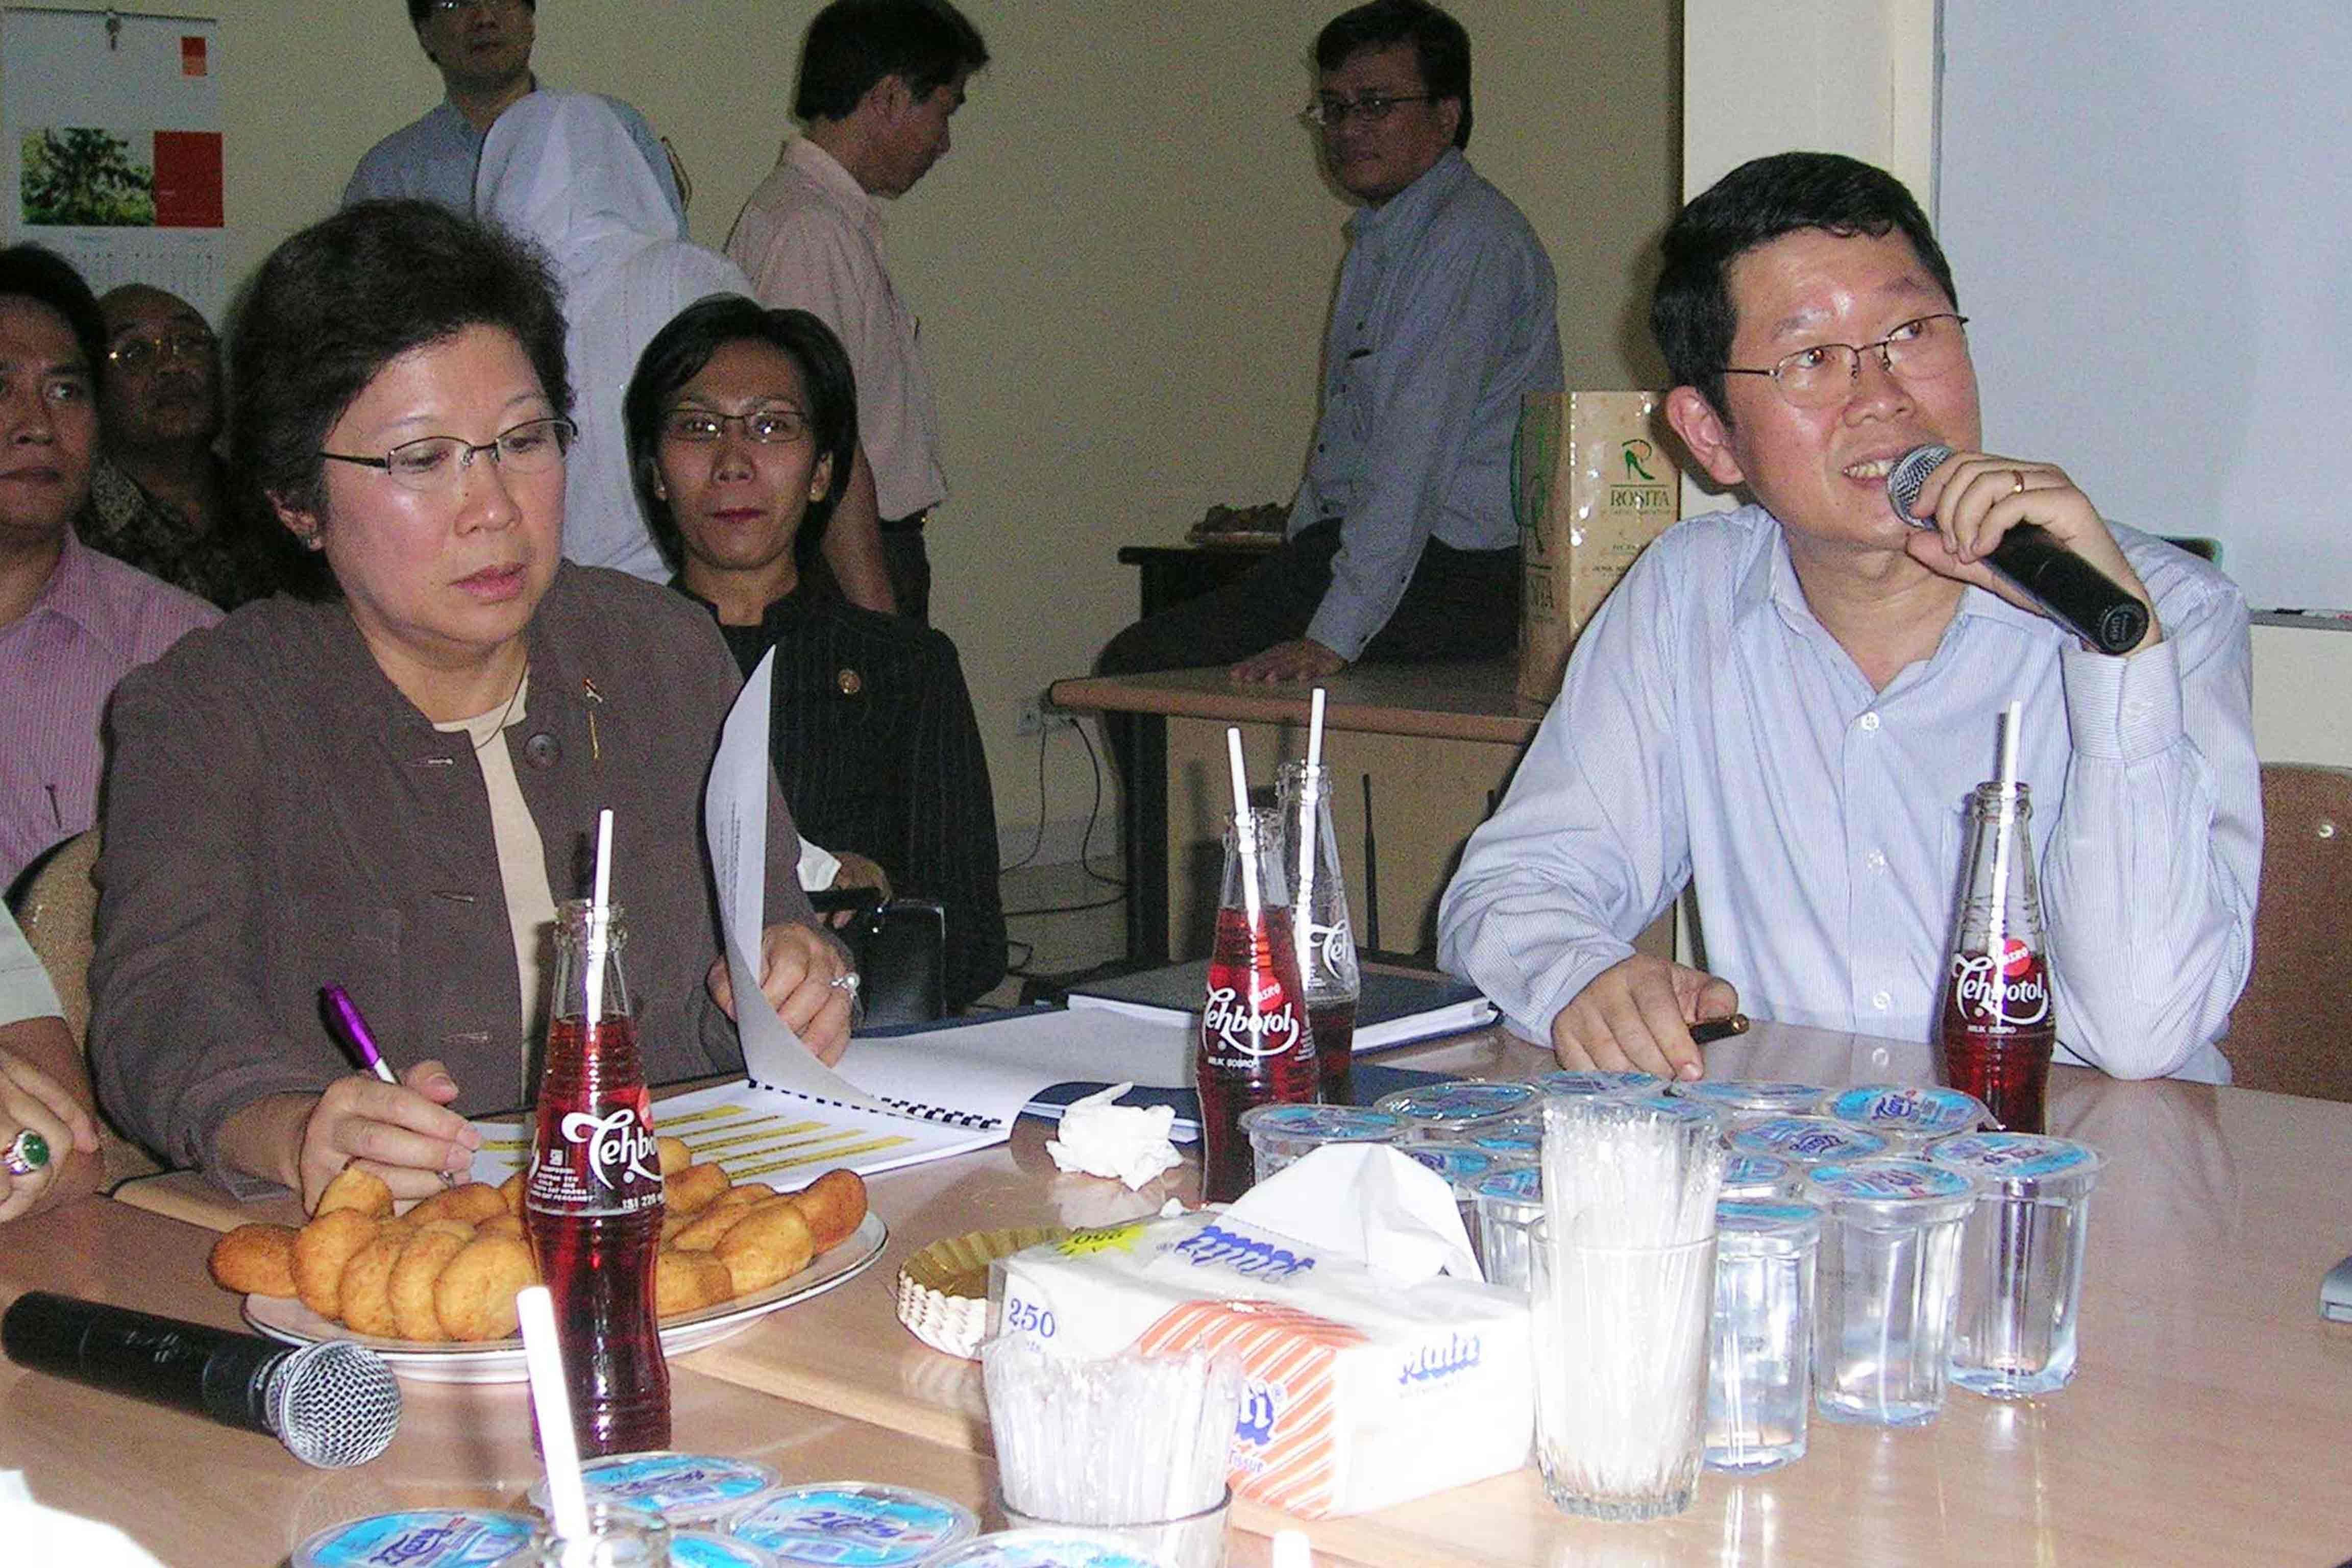 Kunjungan Pejabat Negara, Menteri Perdagangan Mari Elka Pangestu ke Pasar Induk Tanah Tinggi,  Pada Tahun 2005